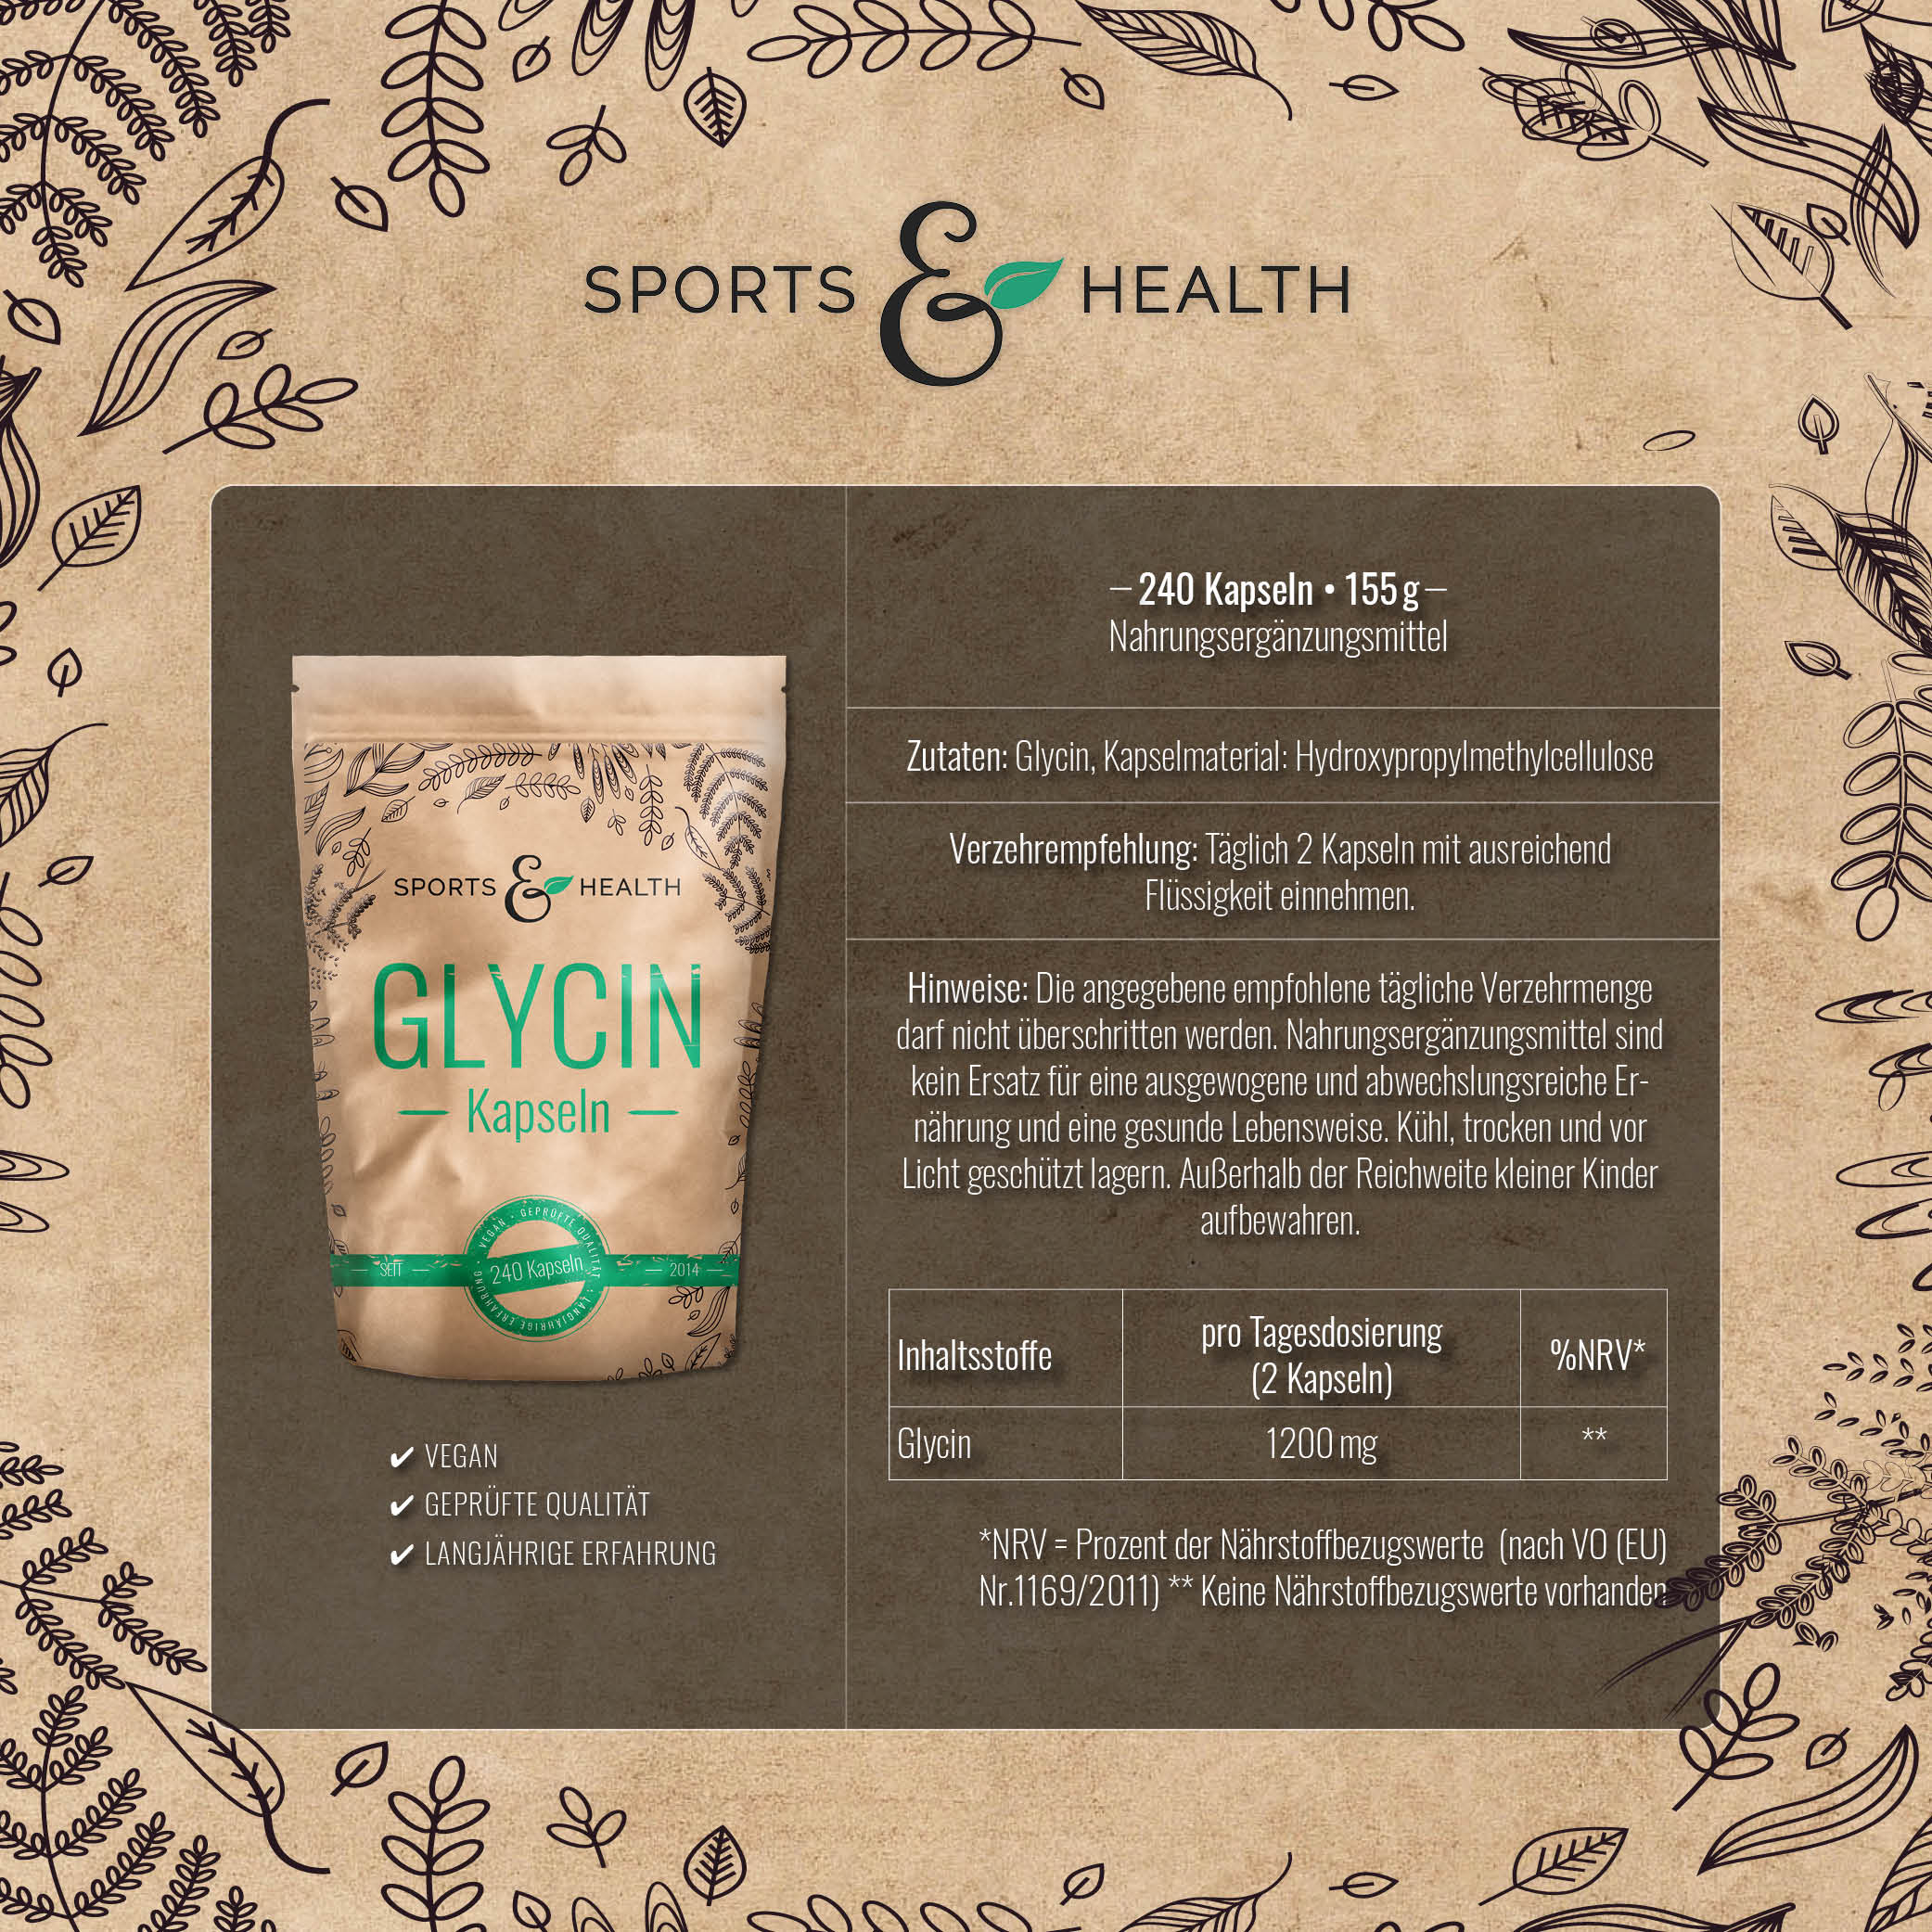 Glycin Kapseln Inhalt